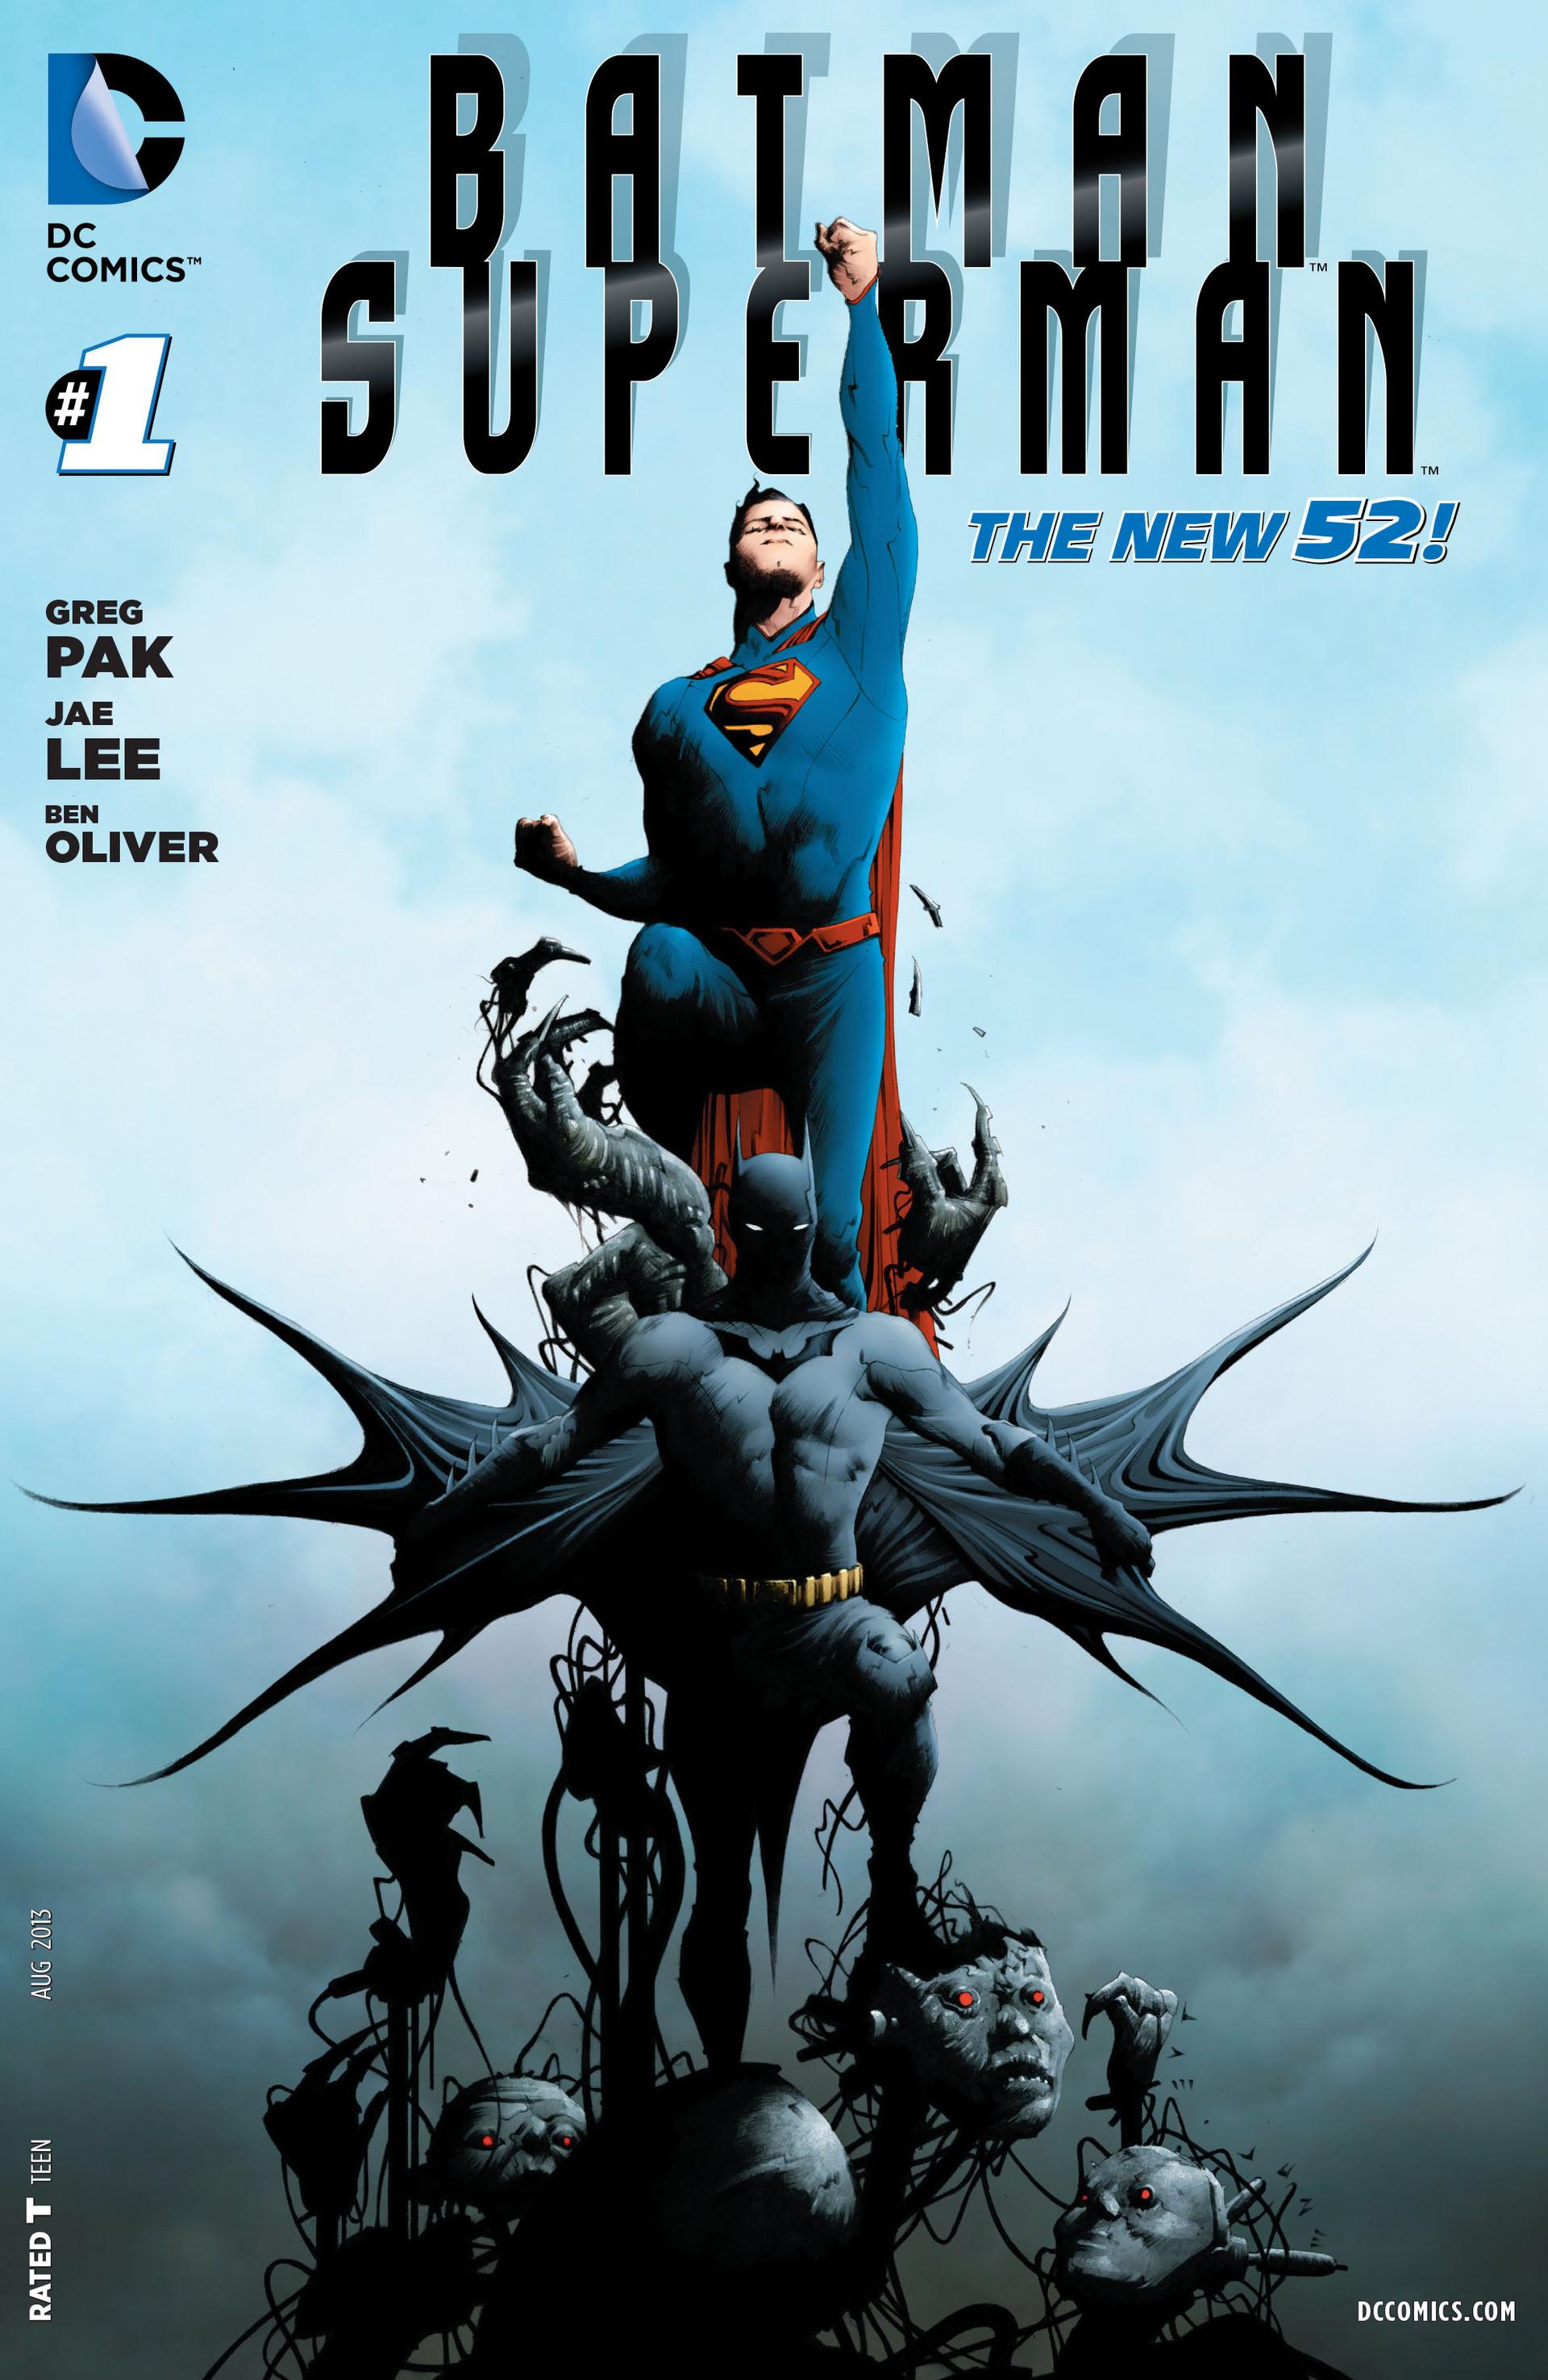 http://img1.wikia.nocookie.net/__cb20130627211607/marvel_dc/images/0/0d/Batman_Superman_Vol_1_1.jpg